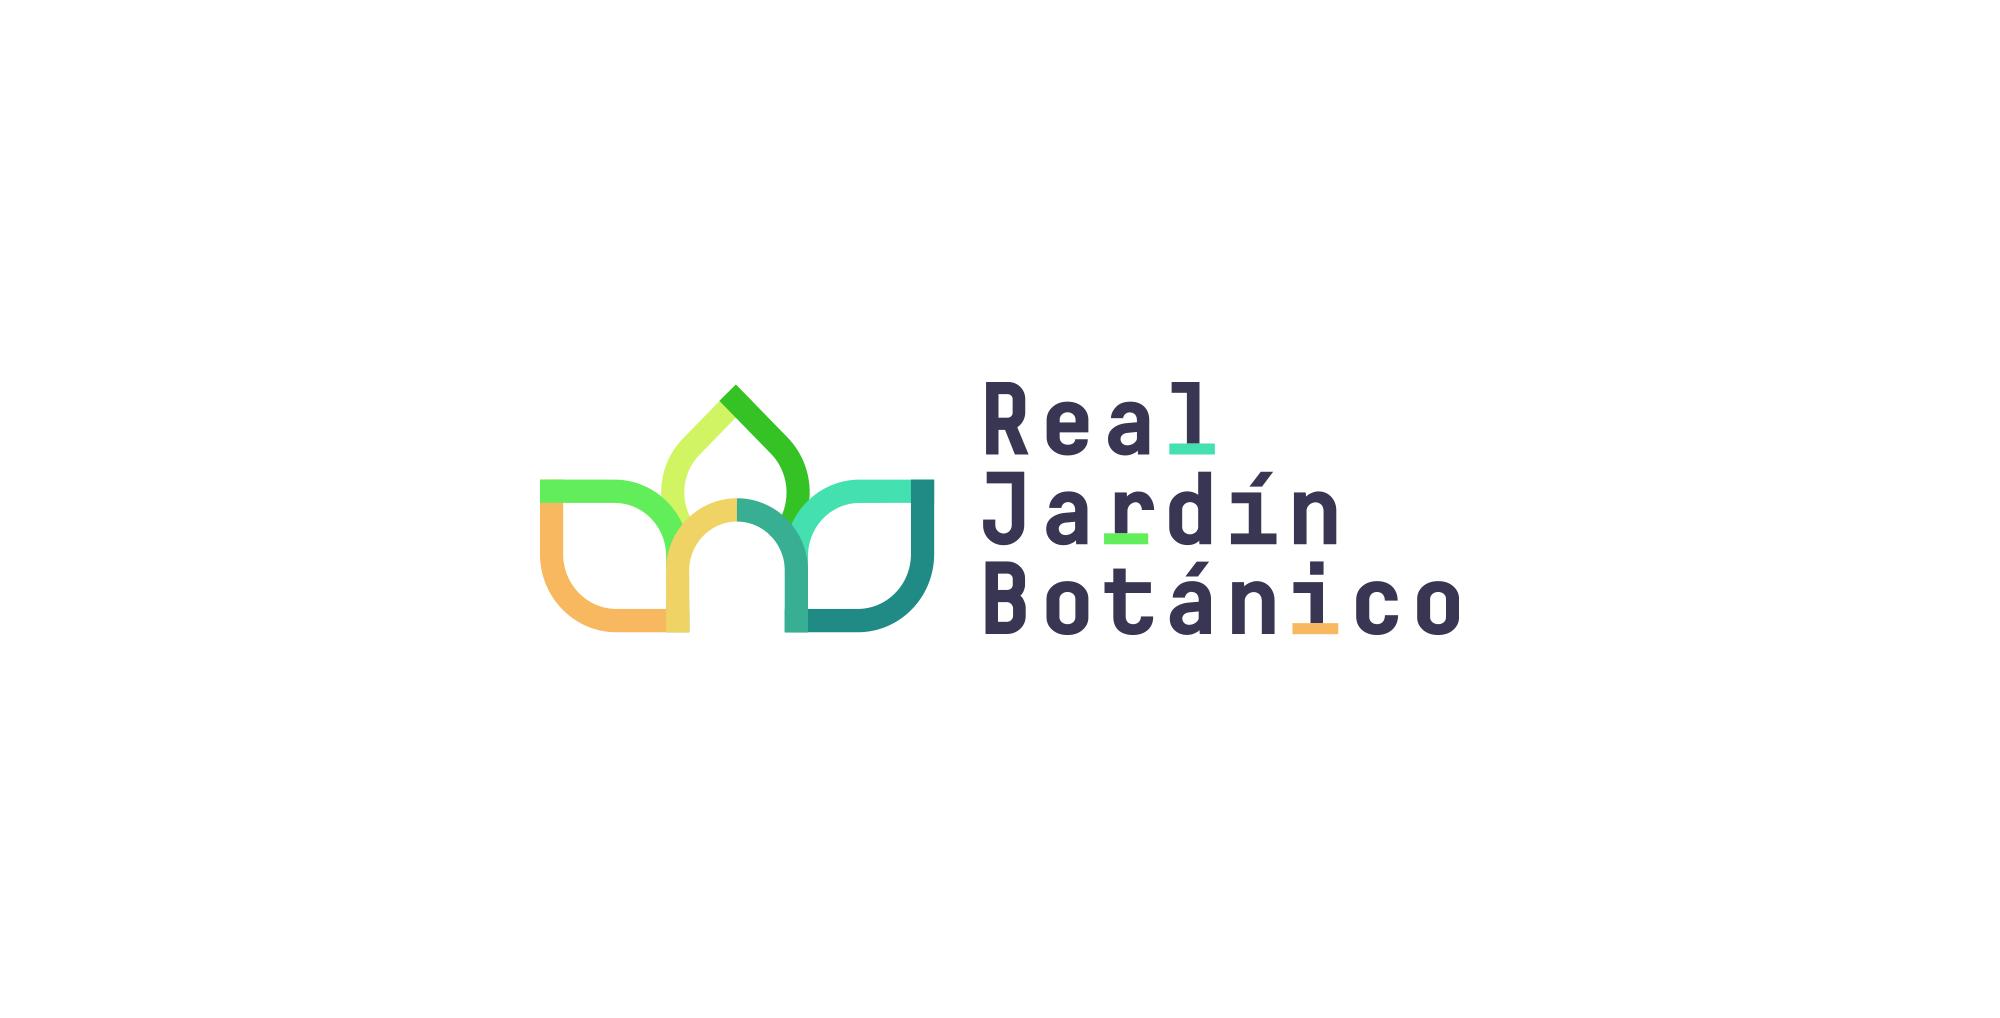 Real Jardín Botánico Branding by The Woork Co